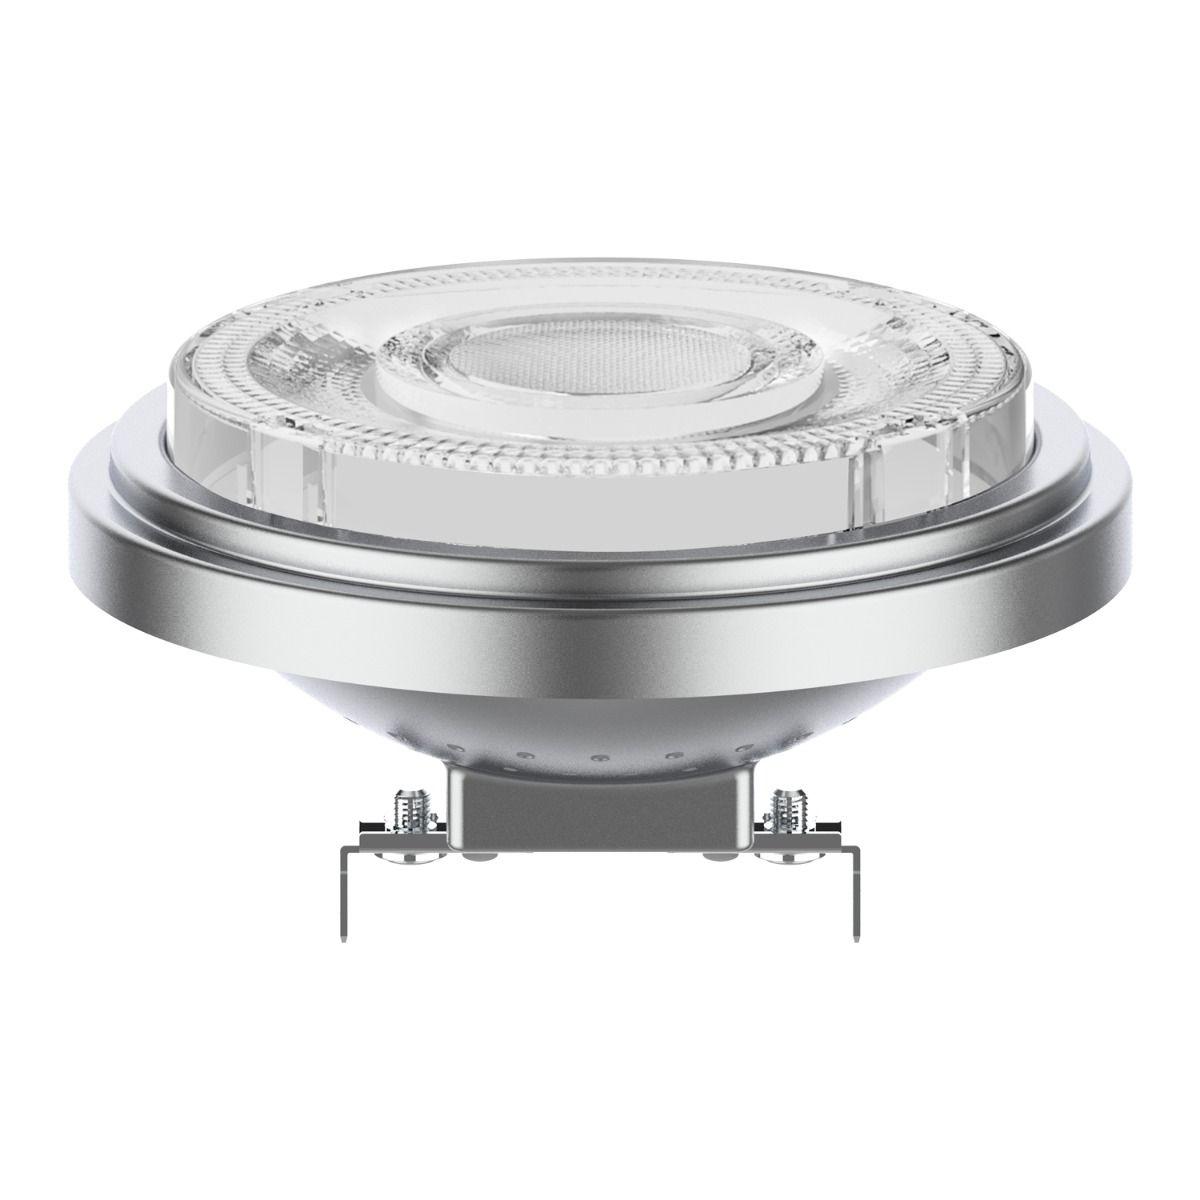 Noxion Lucent LED Spot AR111 G53 12V 7.3W 927 24D | Dimmable - Best Colour Rendering - Replaces 50W